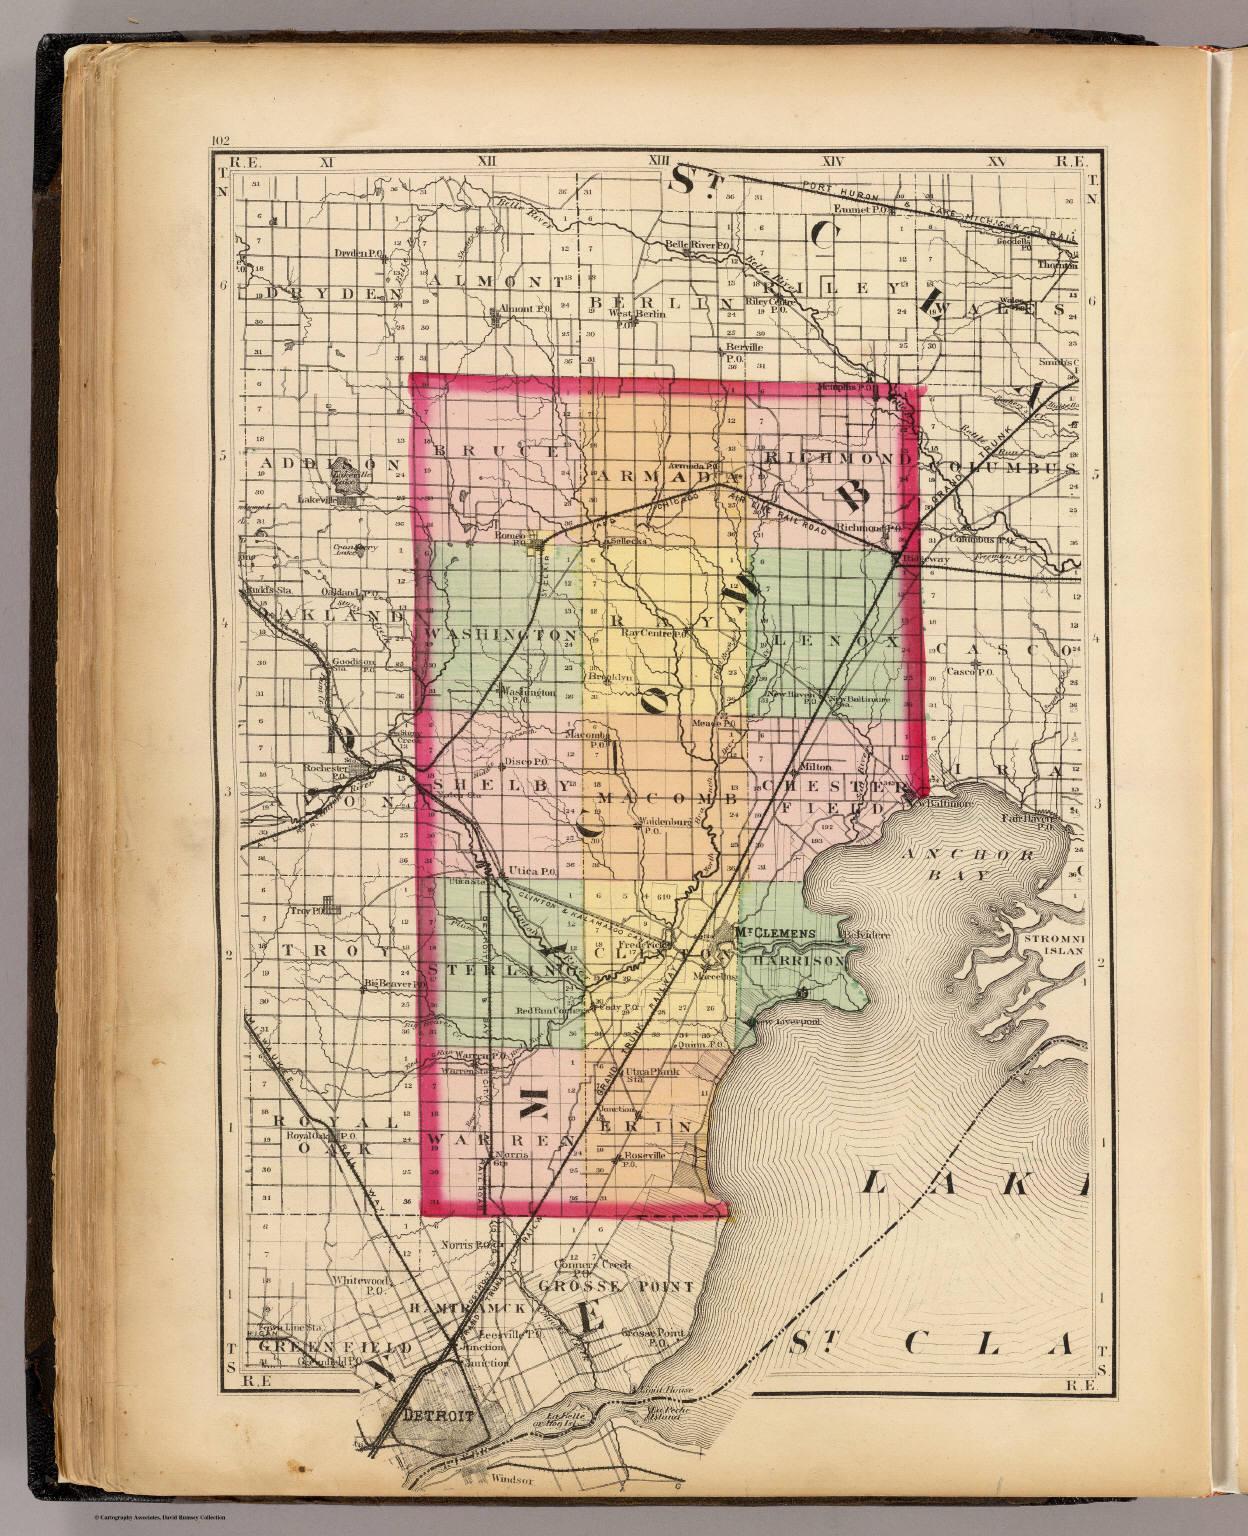 (Map of Macomb County, Michigan)